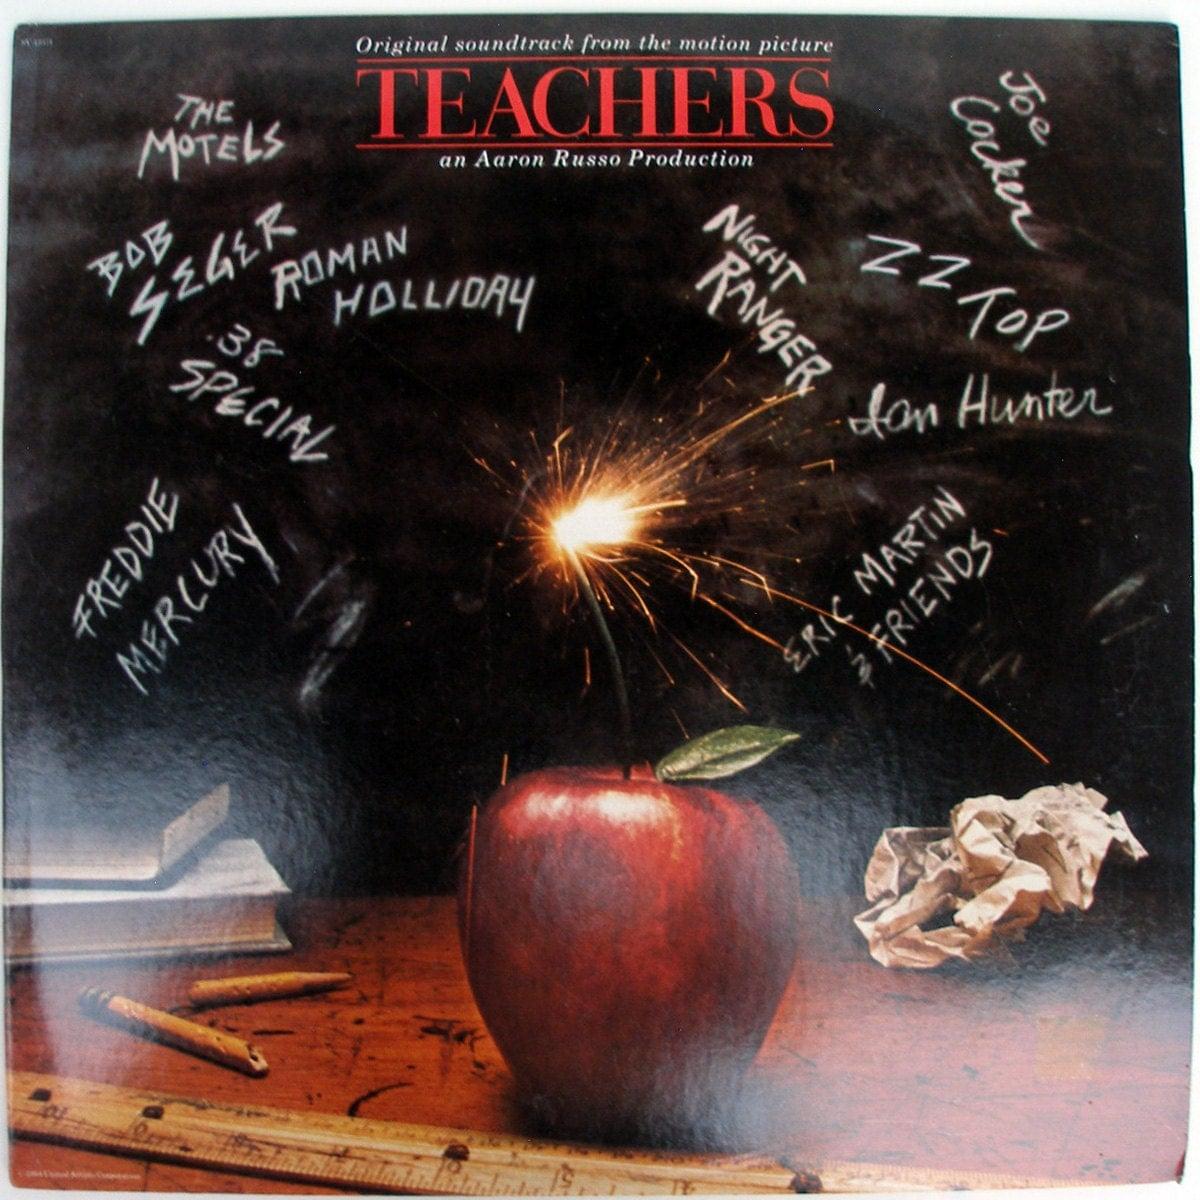 Teachers Soundtrack From The Motion Picture Sv 12371 Joe